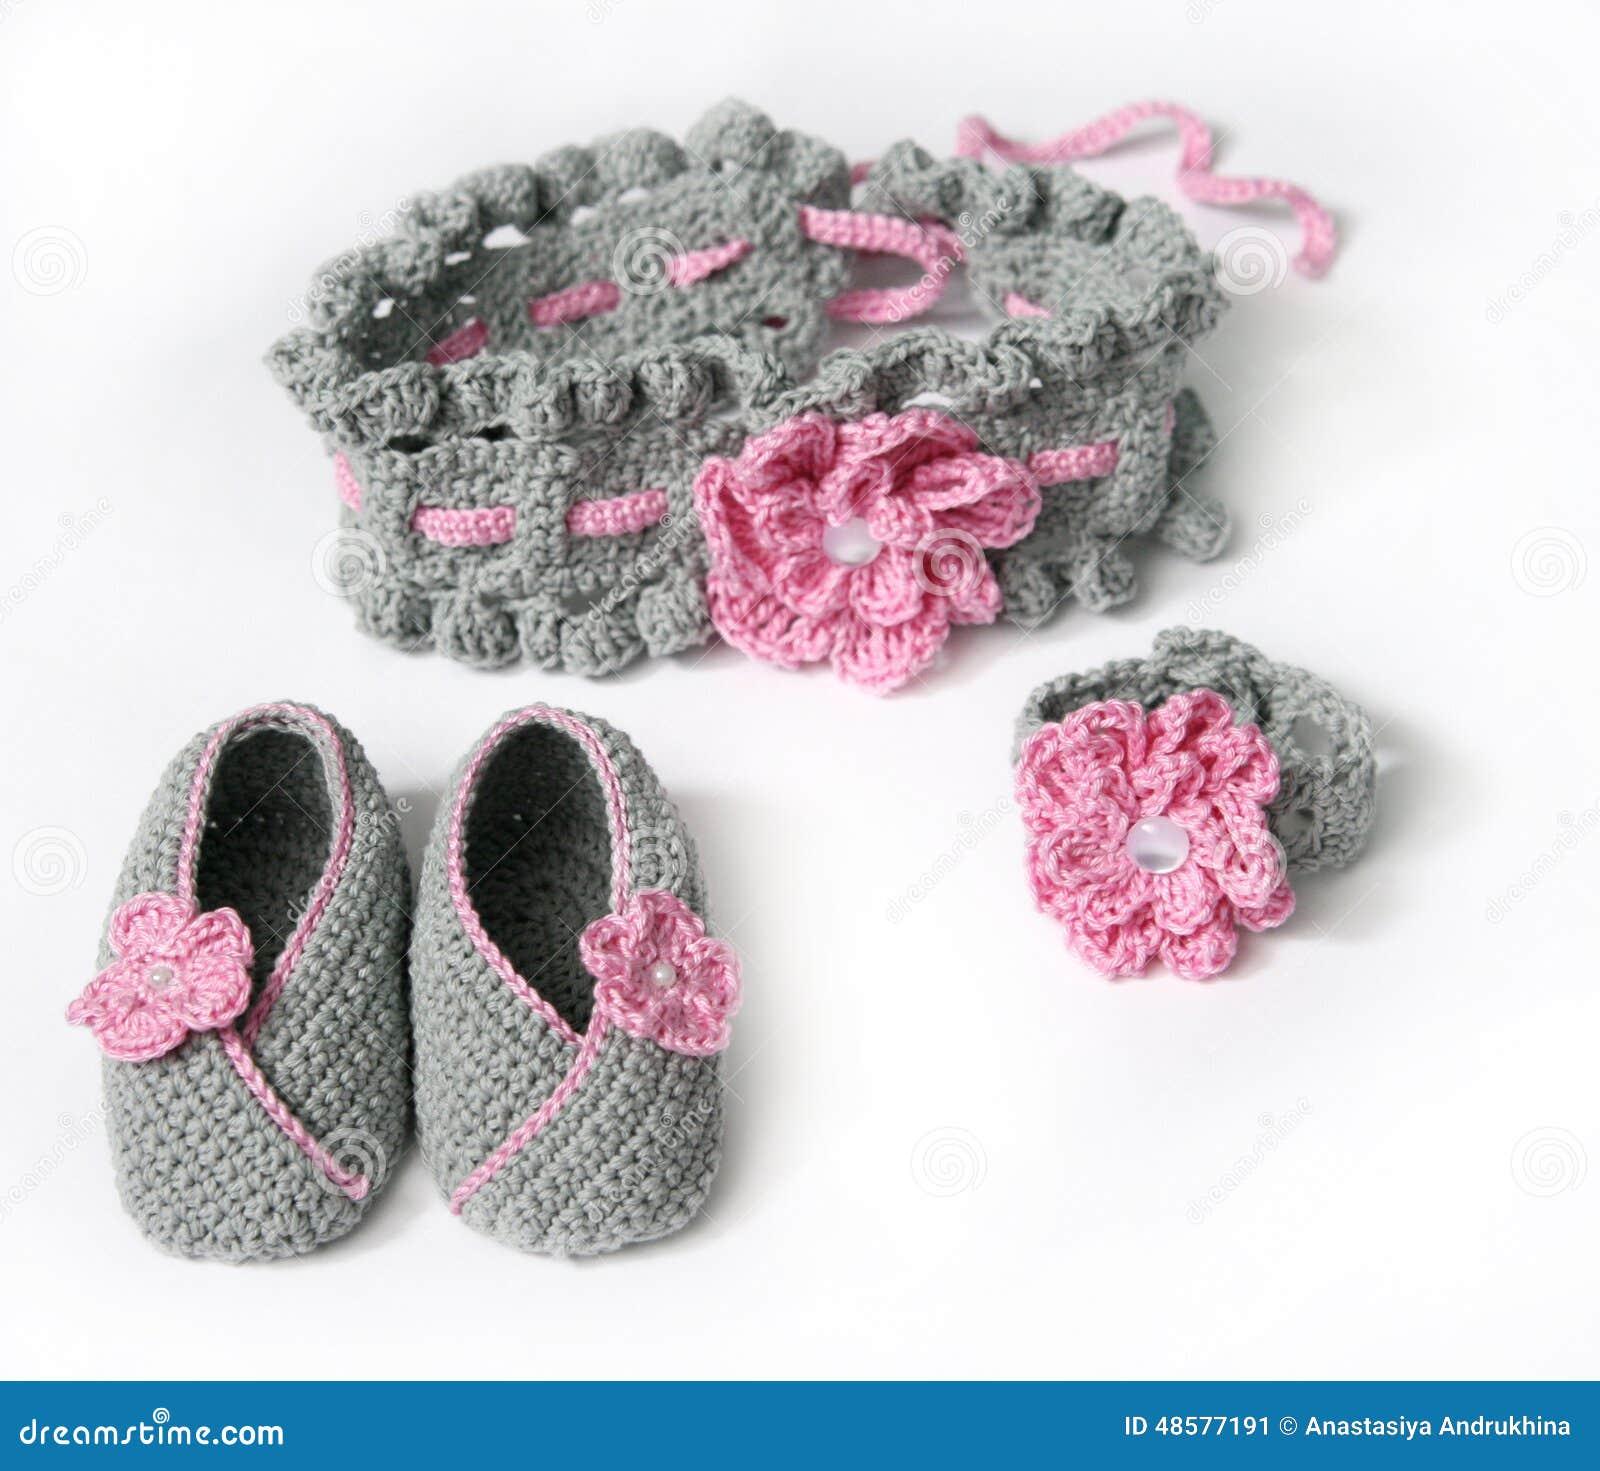 Grey Crochet Baby Booties And Headband With Stock Image Image Of